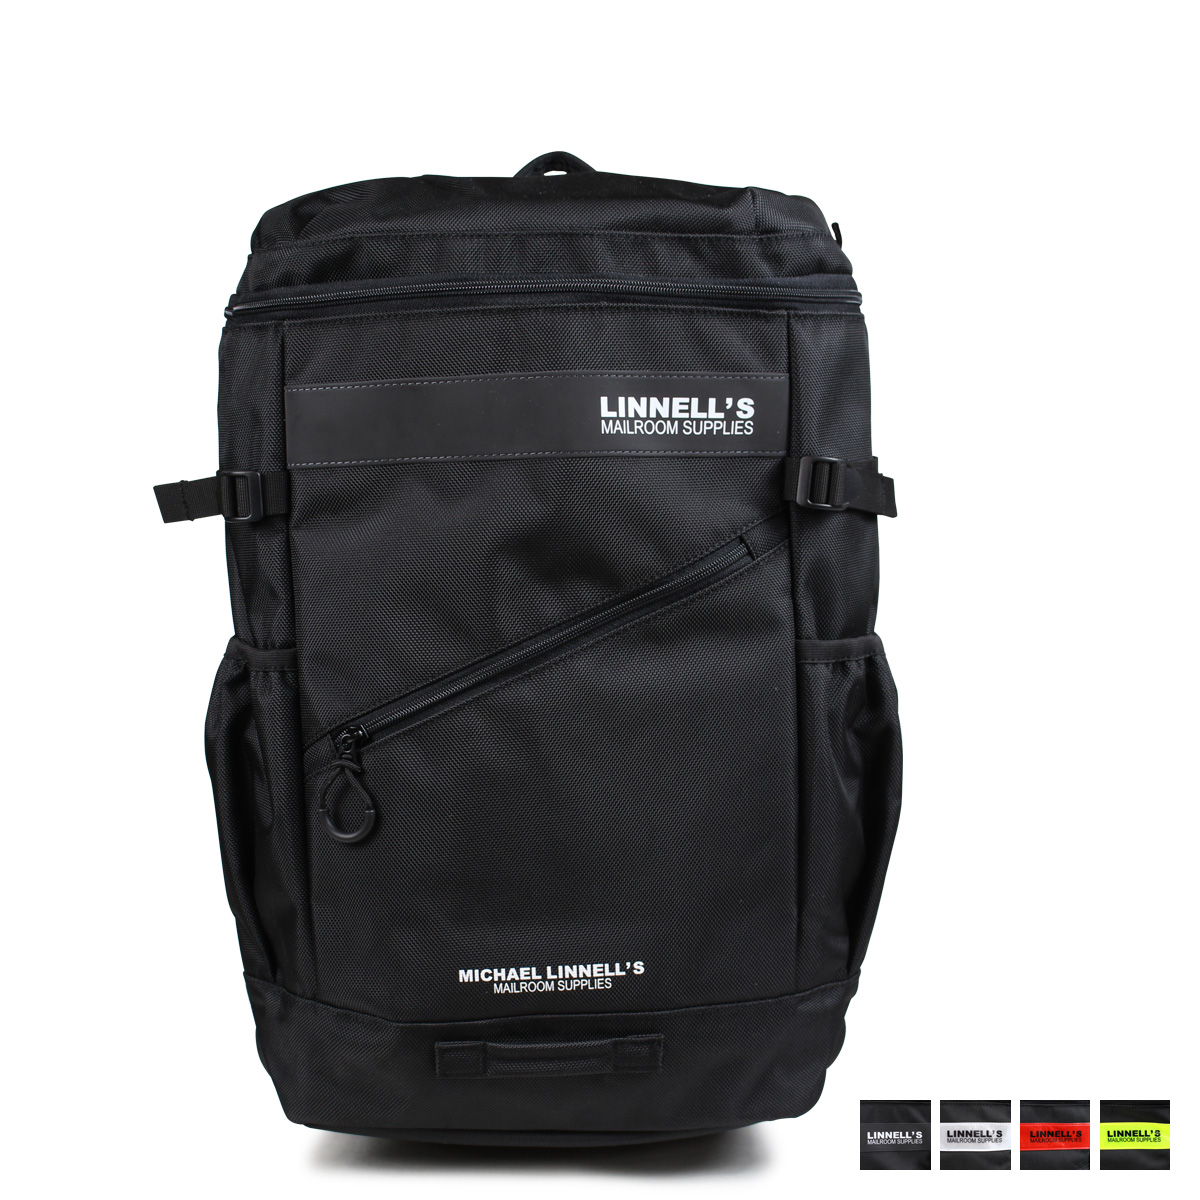 MICHAEL LINNELL BOX BACKPACK マイケルリンネル リュック バッグ 32L メンズ レディース バックパック ML-020